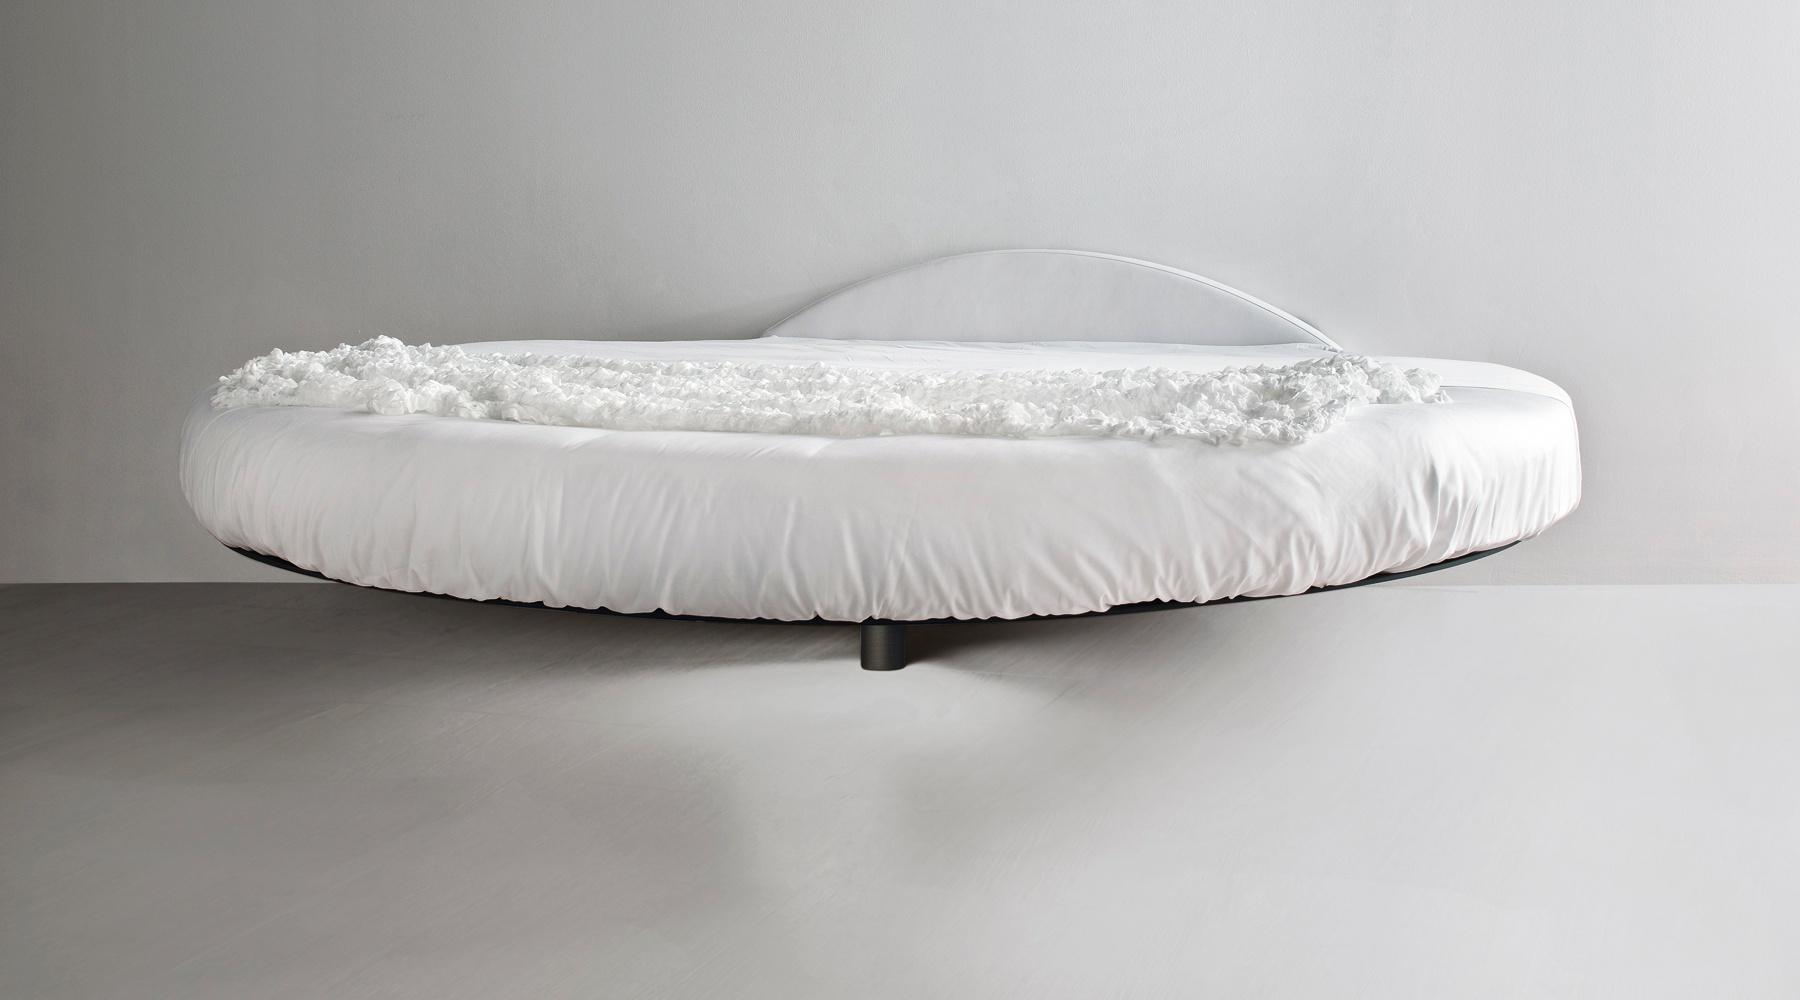 Full Size of Innocent Betten Bett Ausstellungsstück Moebel De Günstige Keilkissen Rundes Coole 180x200 Boxspring Graues Günstiges Stauraum Modern Design Mit Schubladen Bett Rundes Bett